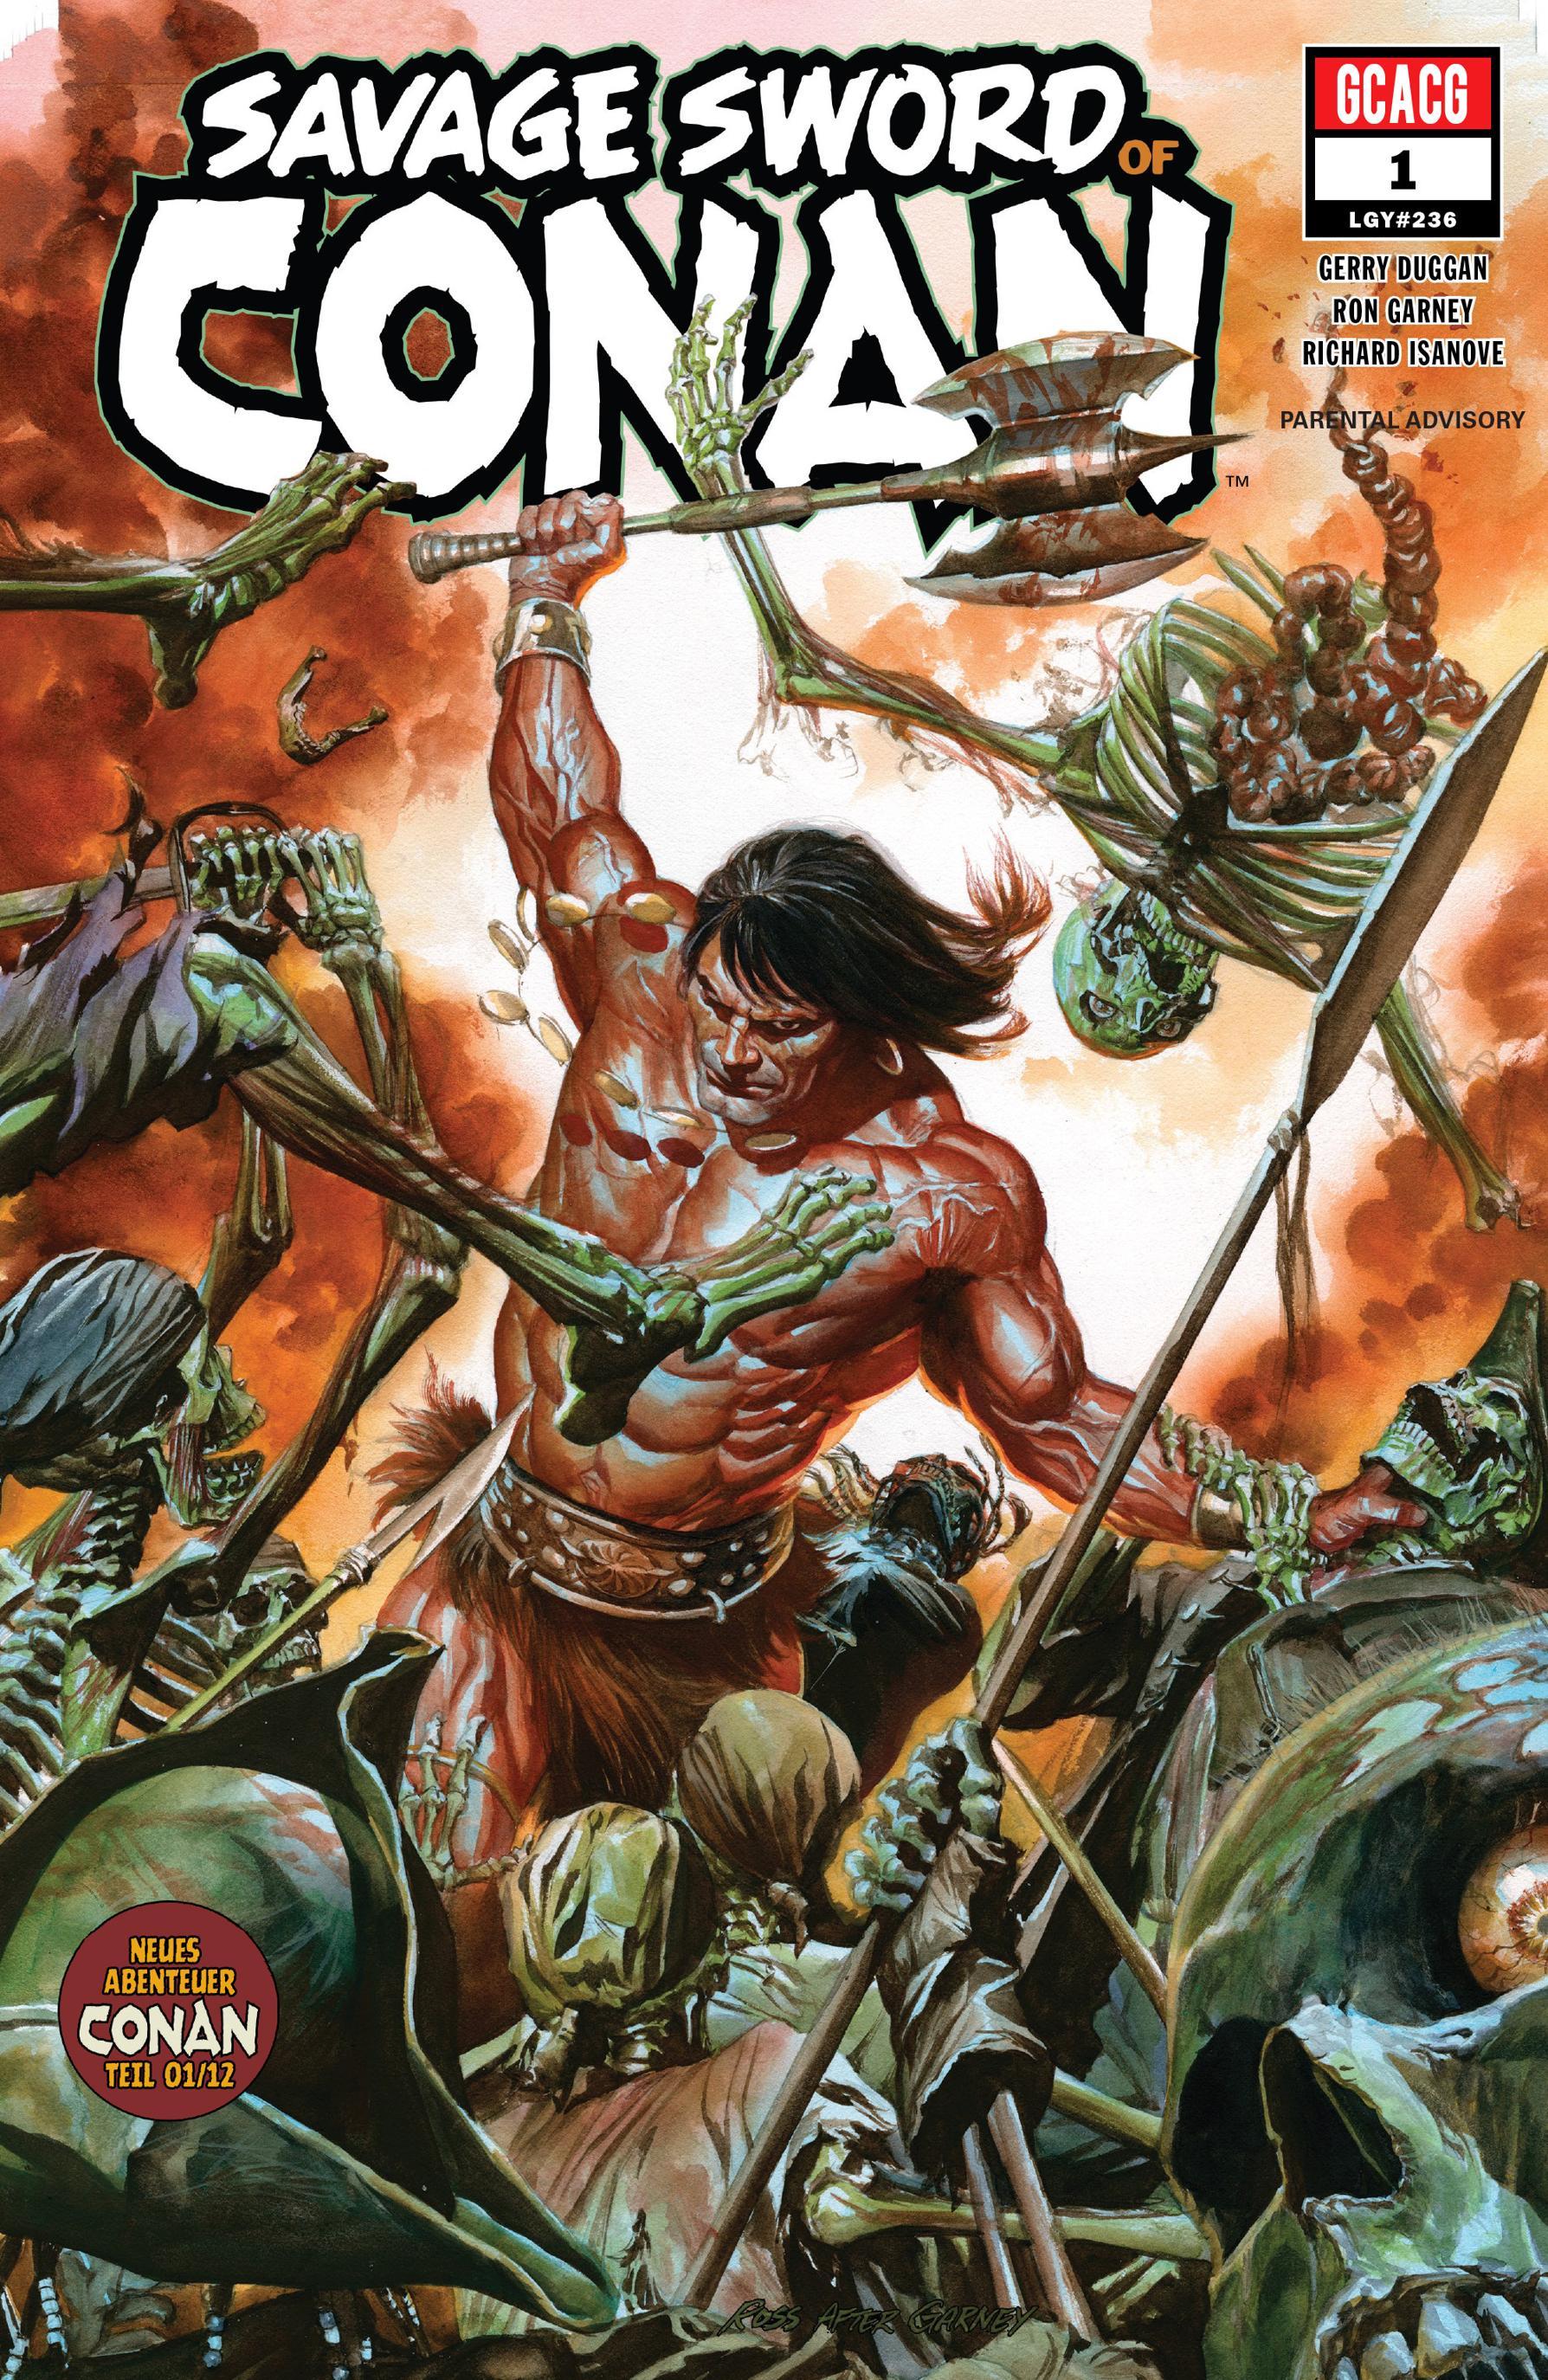 Savage Sword Of Conan 001 - Der Kult des Koga Thun 01 (2019) (Scanlation #736) (2019)